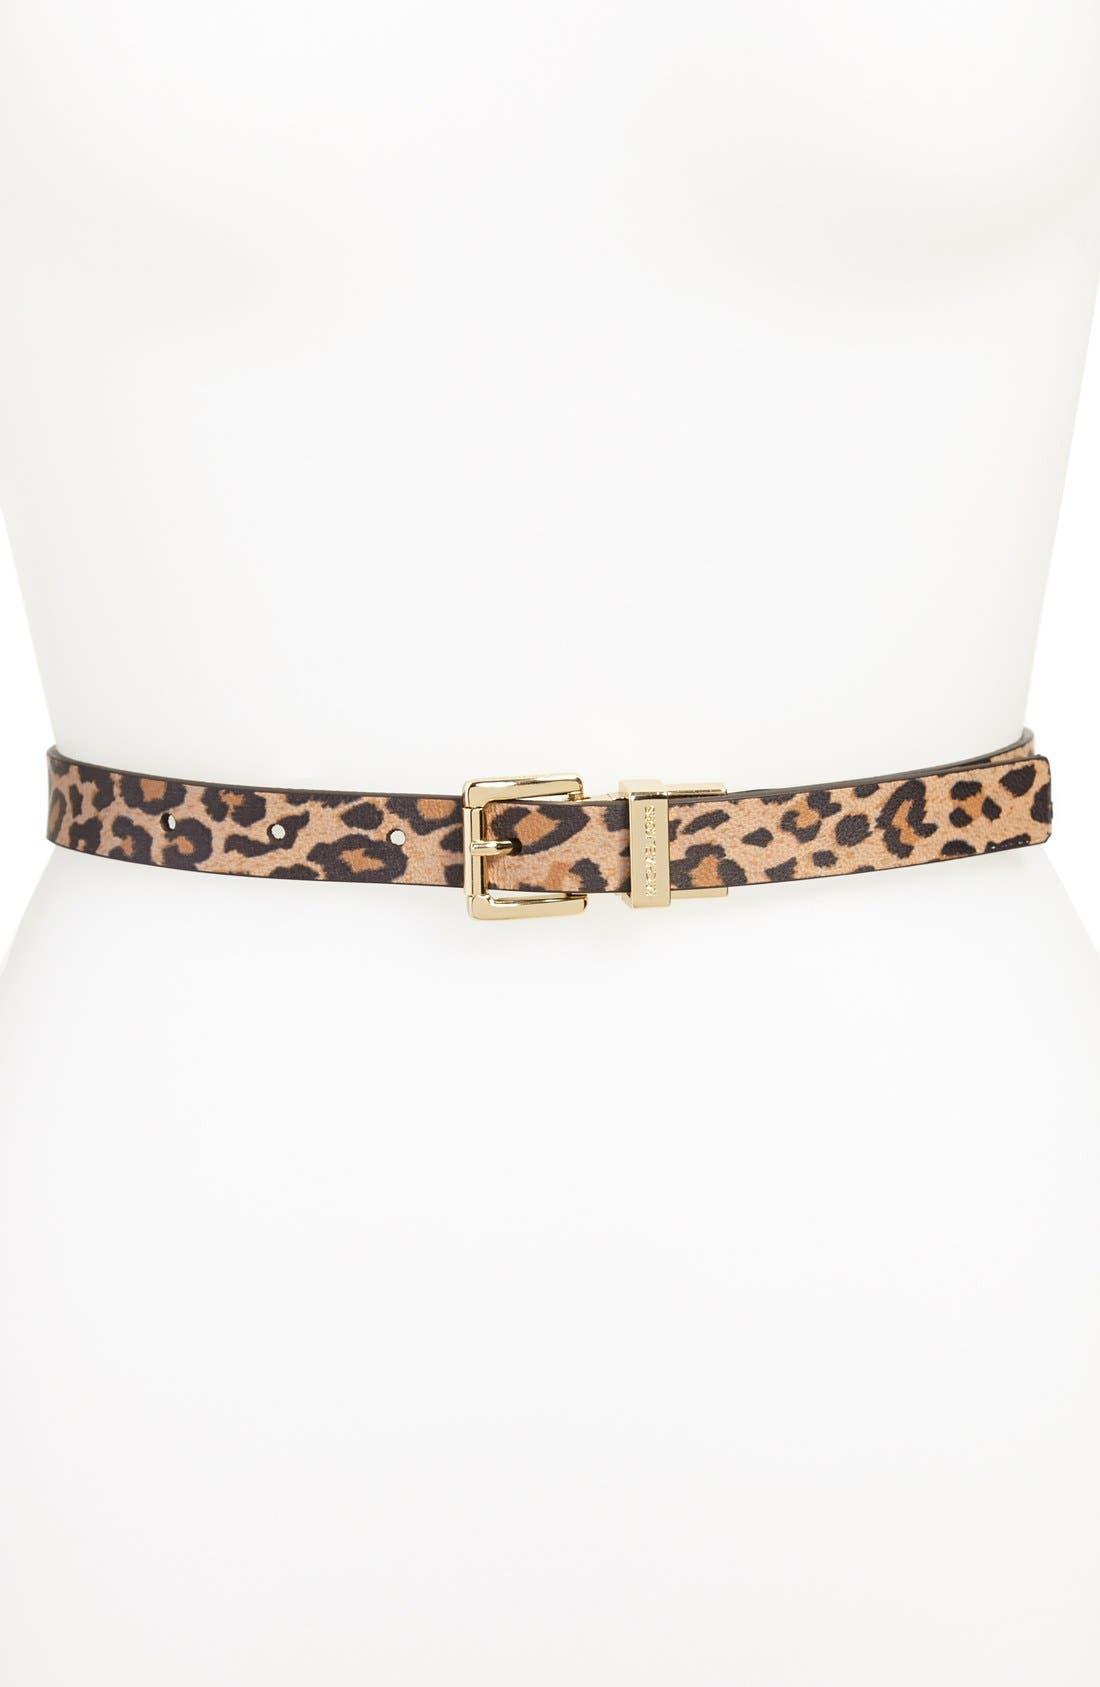 Alternate Image 1 Selected - MICHAEL Michael Kors Reversible Leopard Print Leather Belt